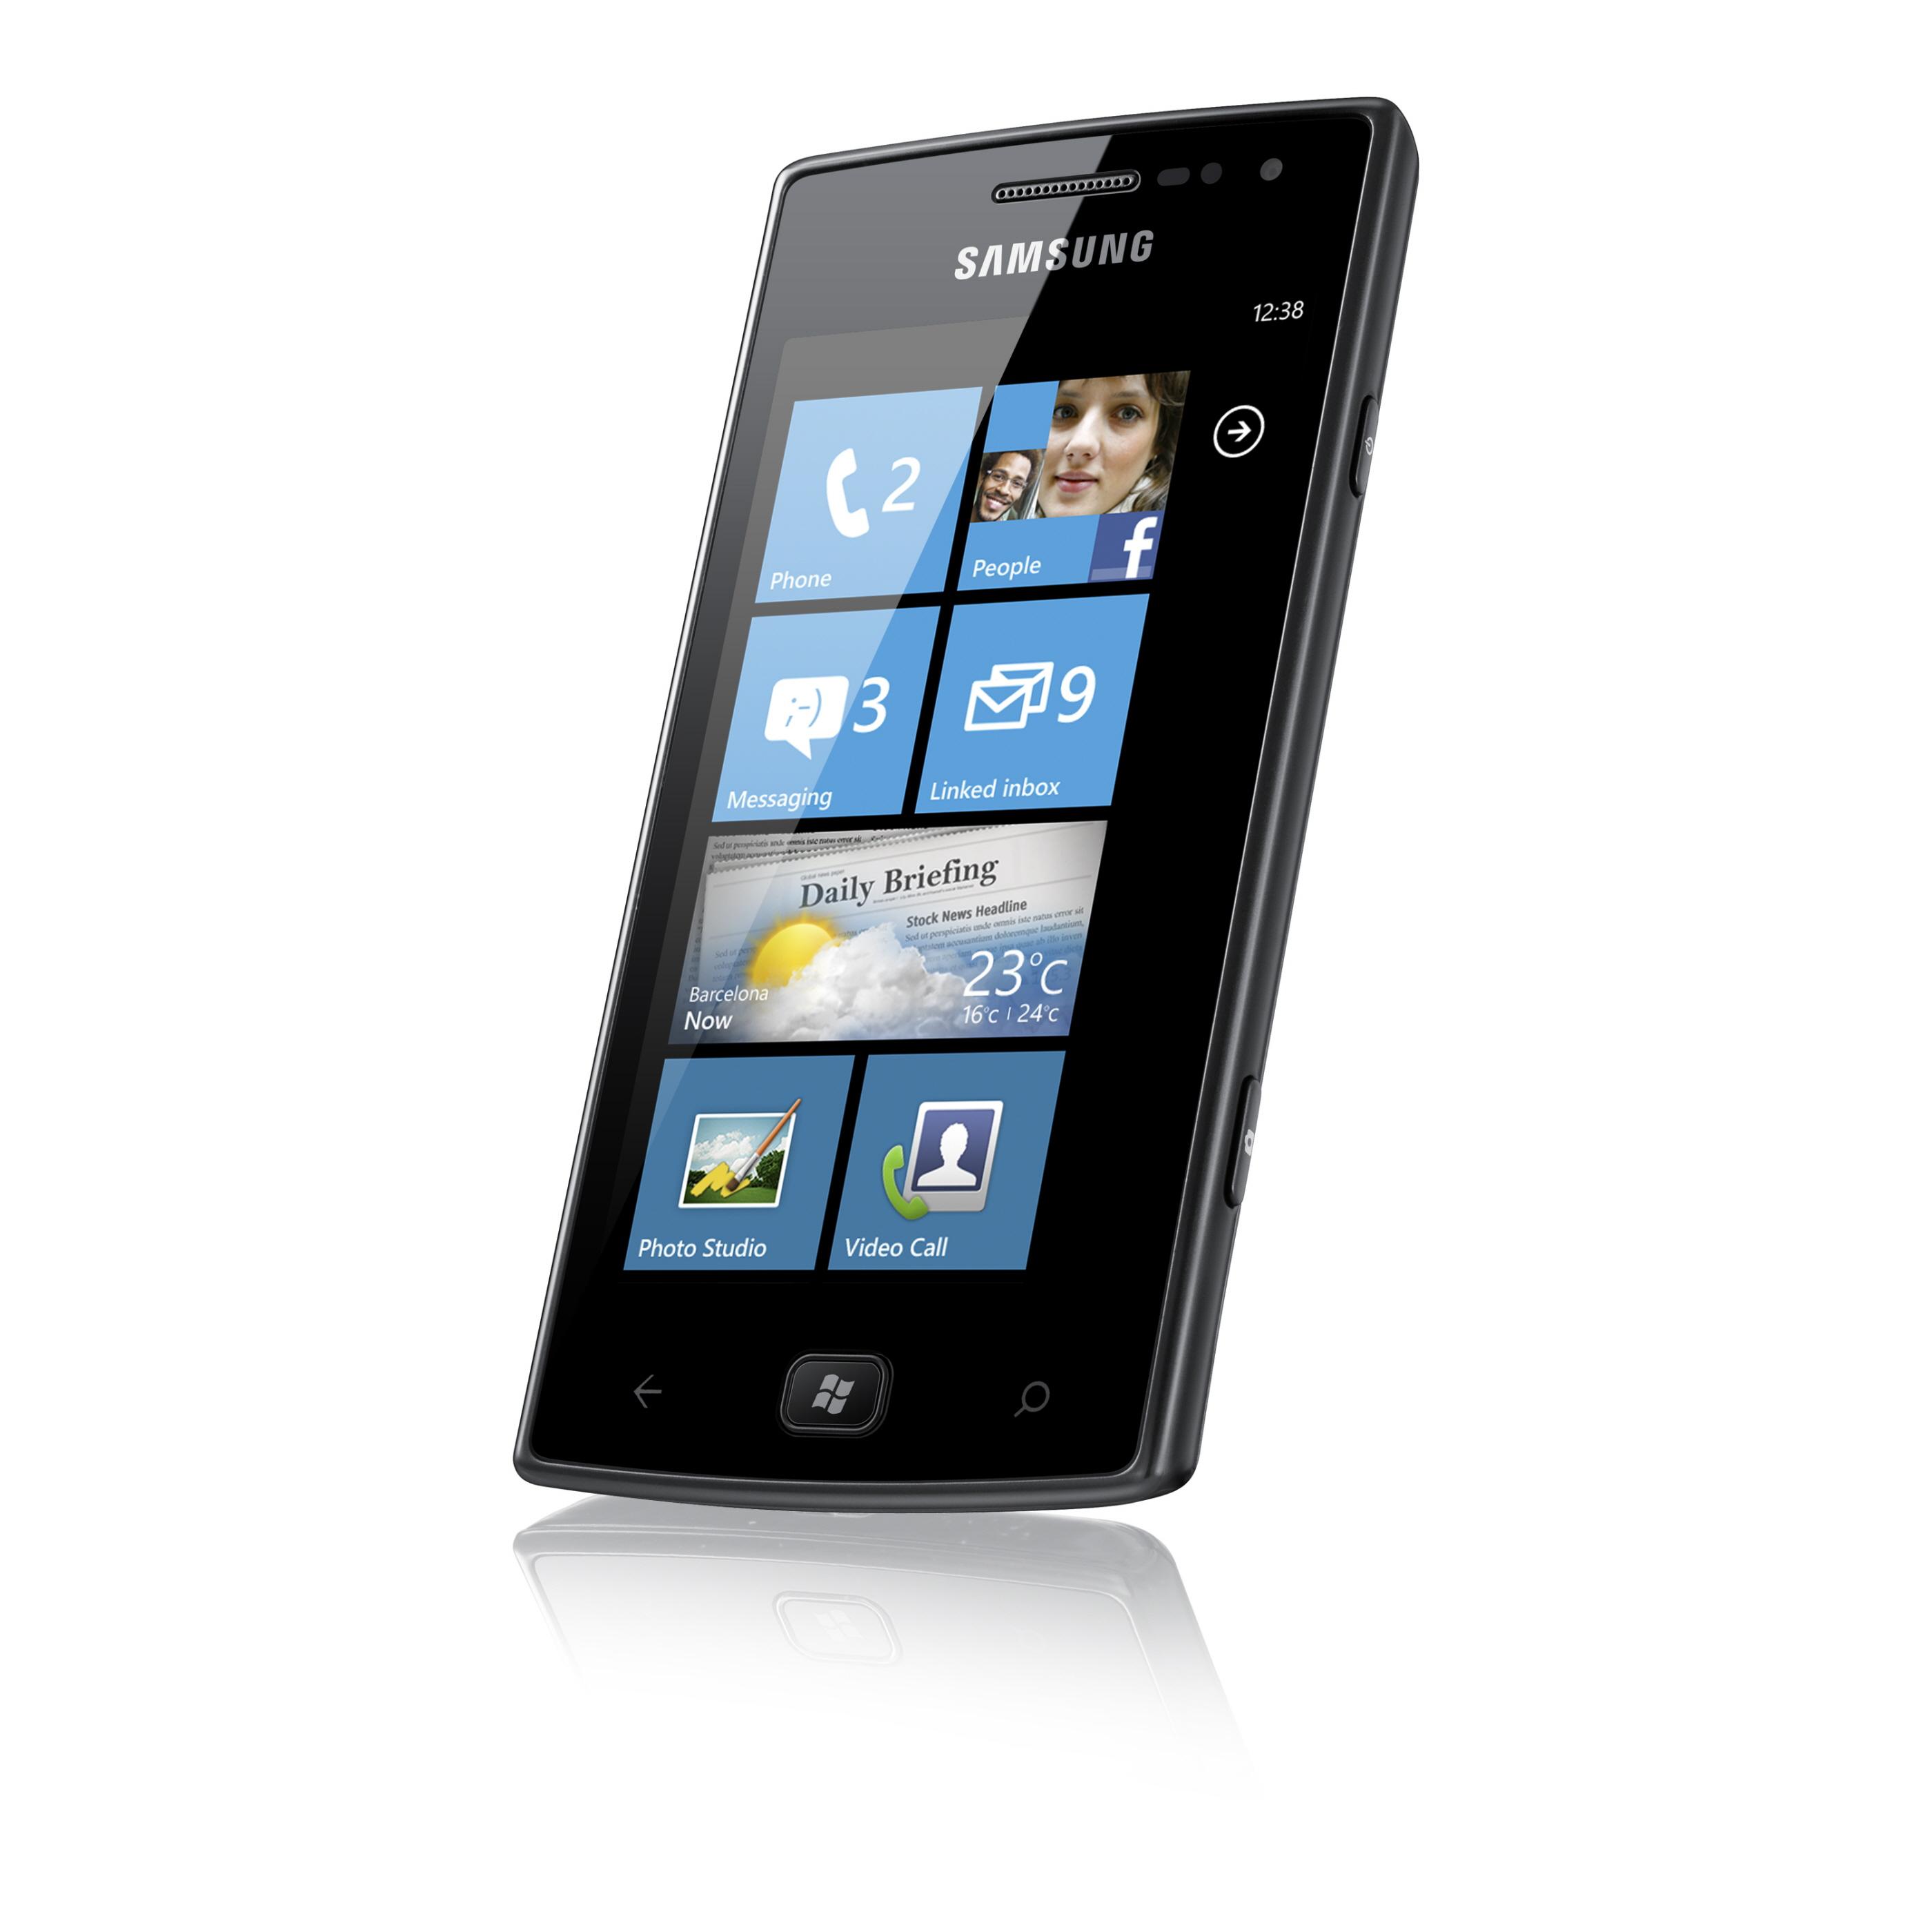 Samsung Omnia W - smartphone z ekranem Super AMOLED i Windows Phone 7.5